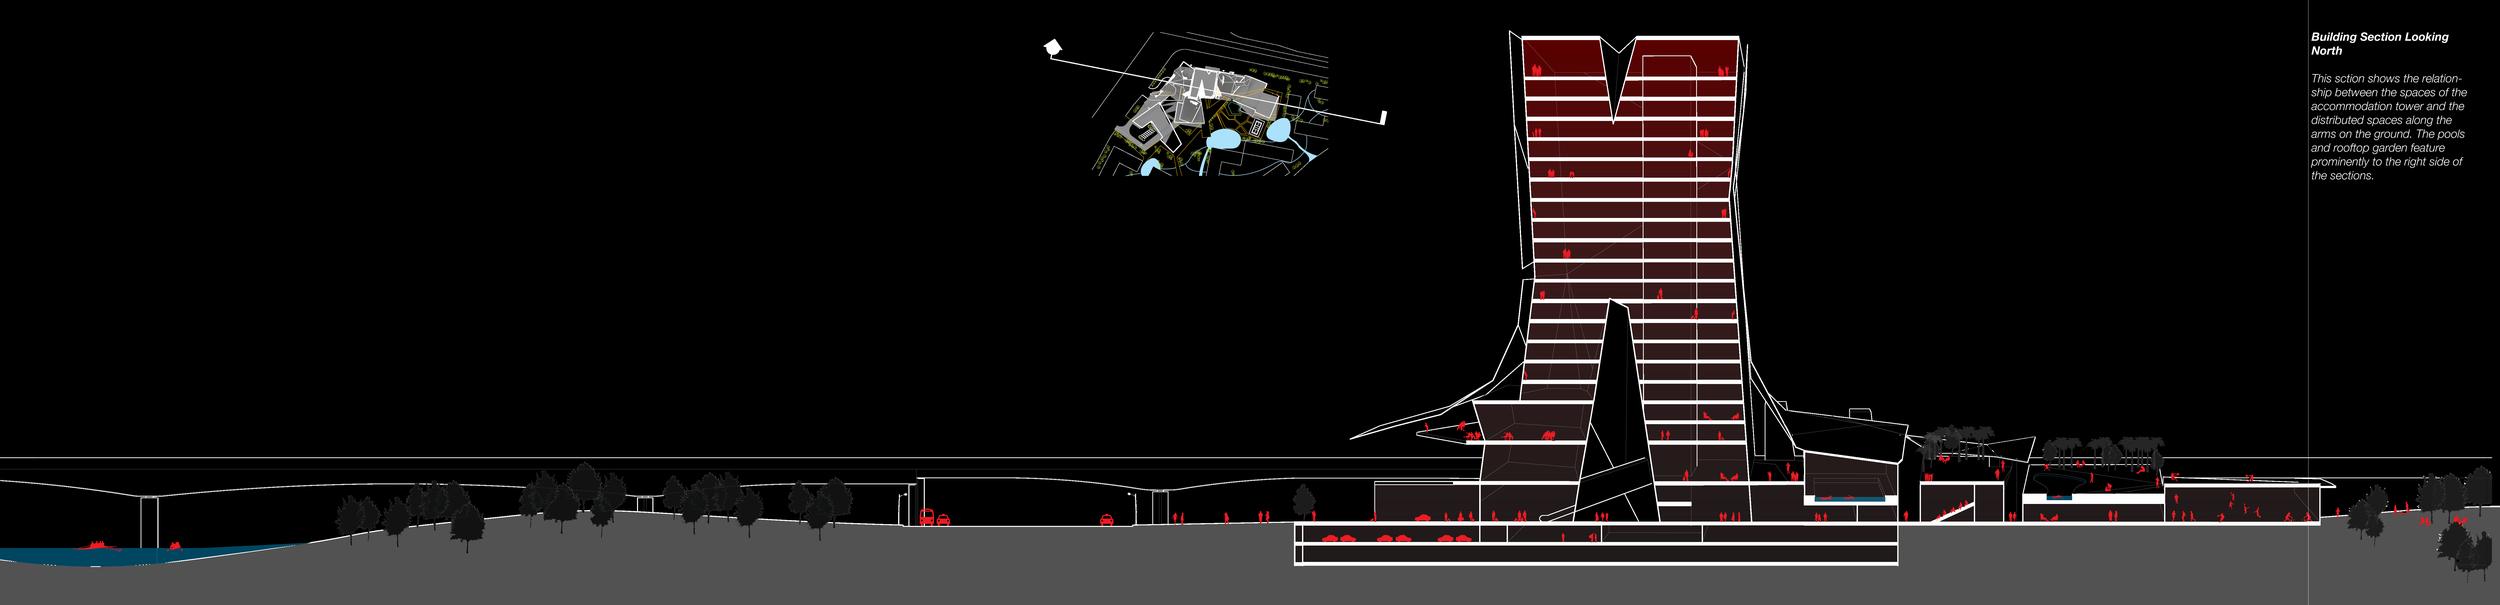 14.Design Proposal_Lee_Sharpe_Telian-9-editA.jpg